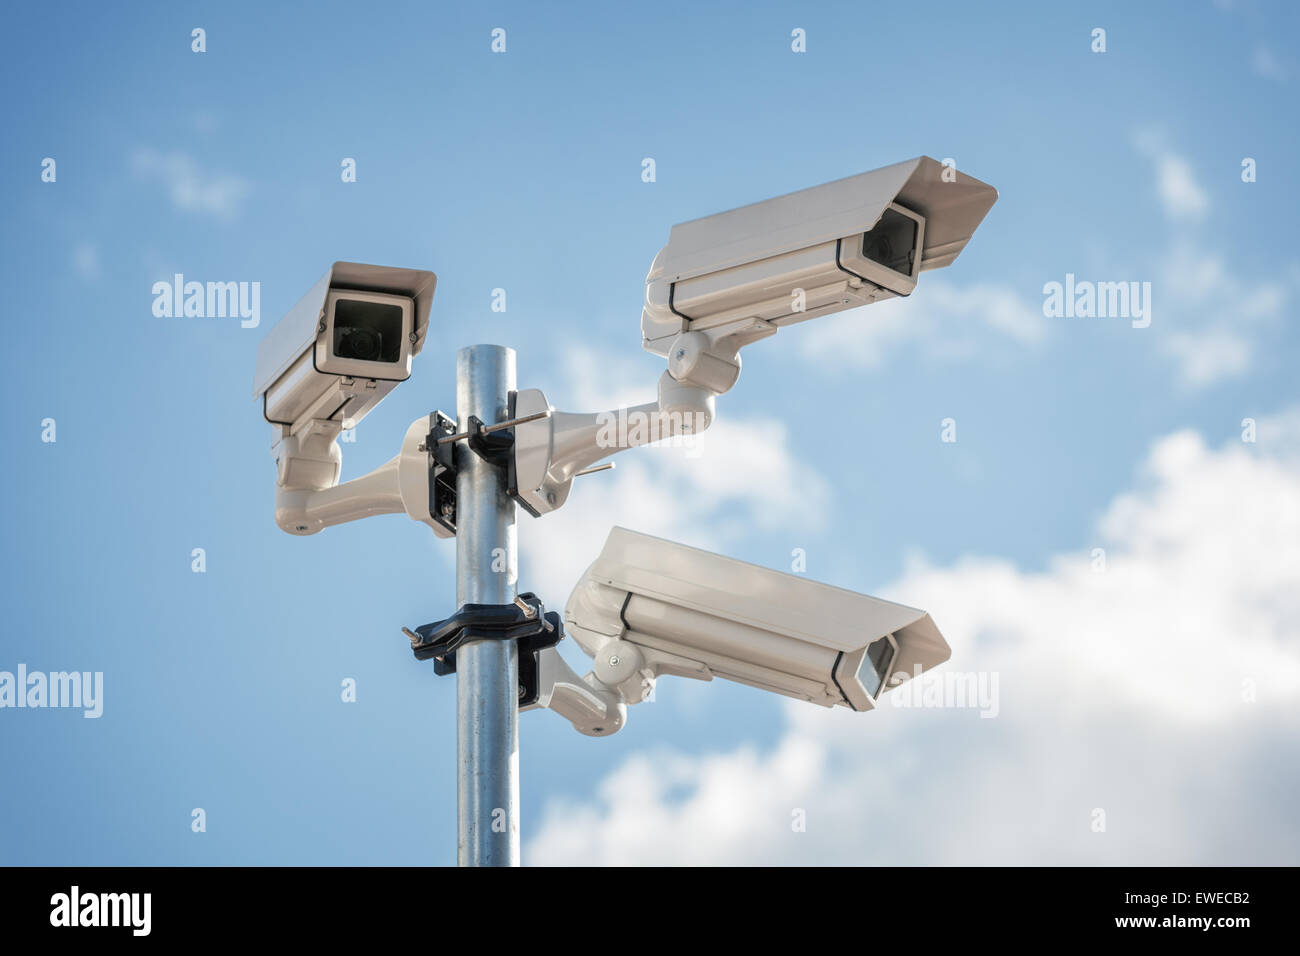 CCTV-Überwachung Überwachungskamera Stockbild